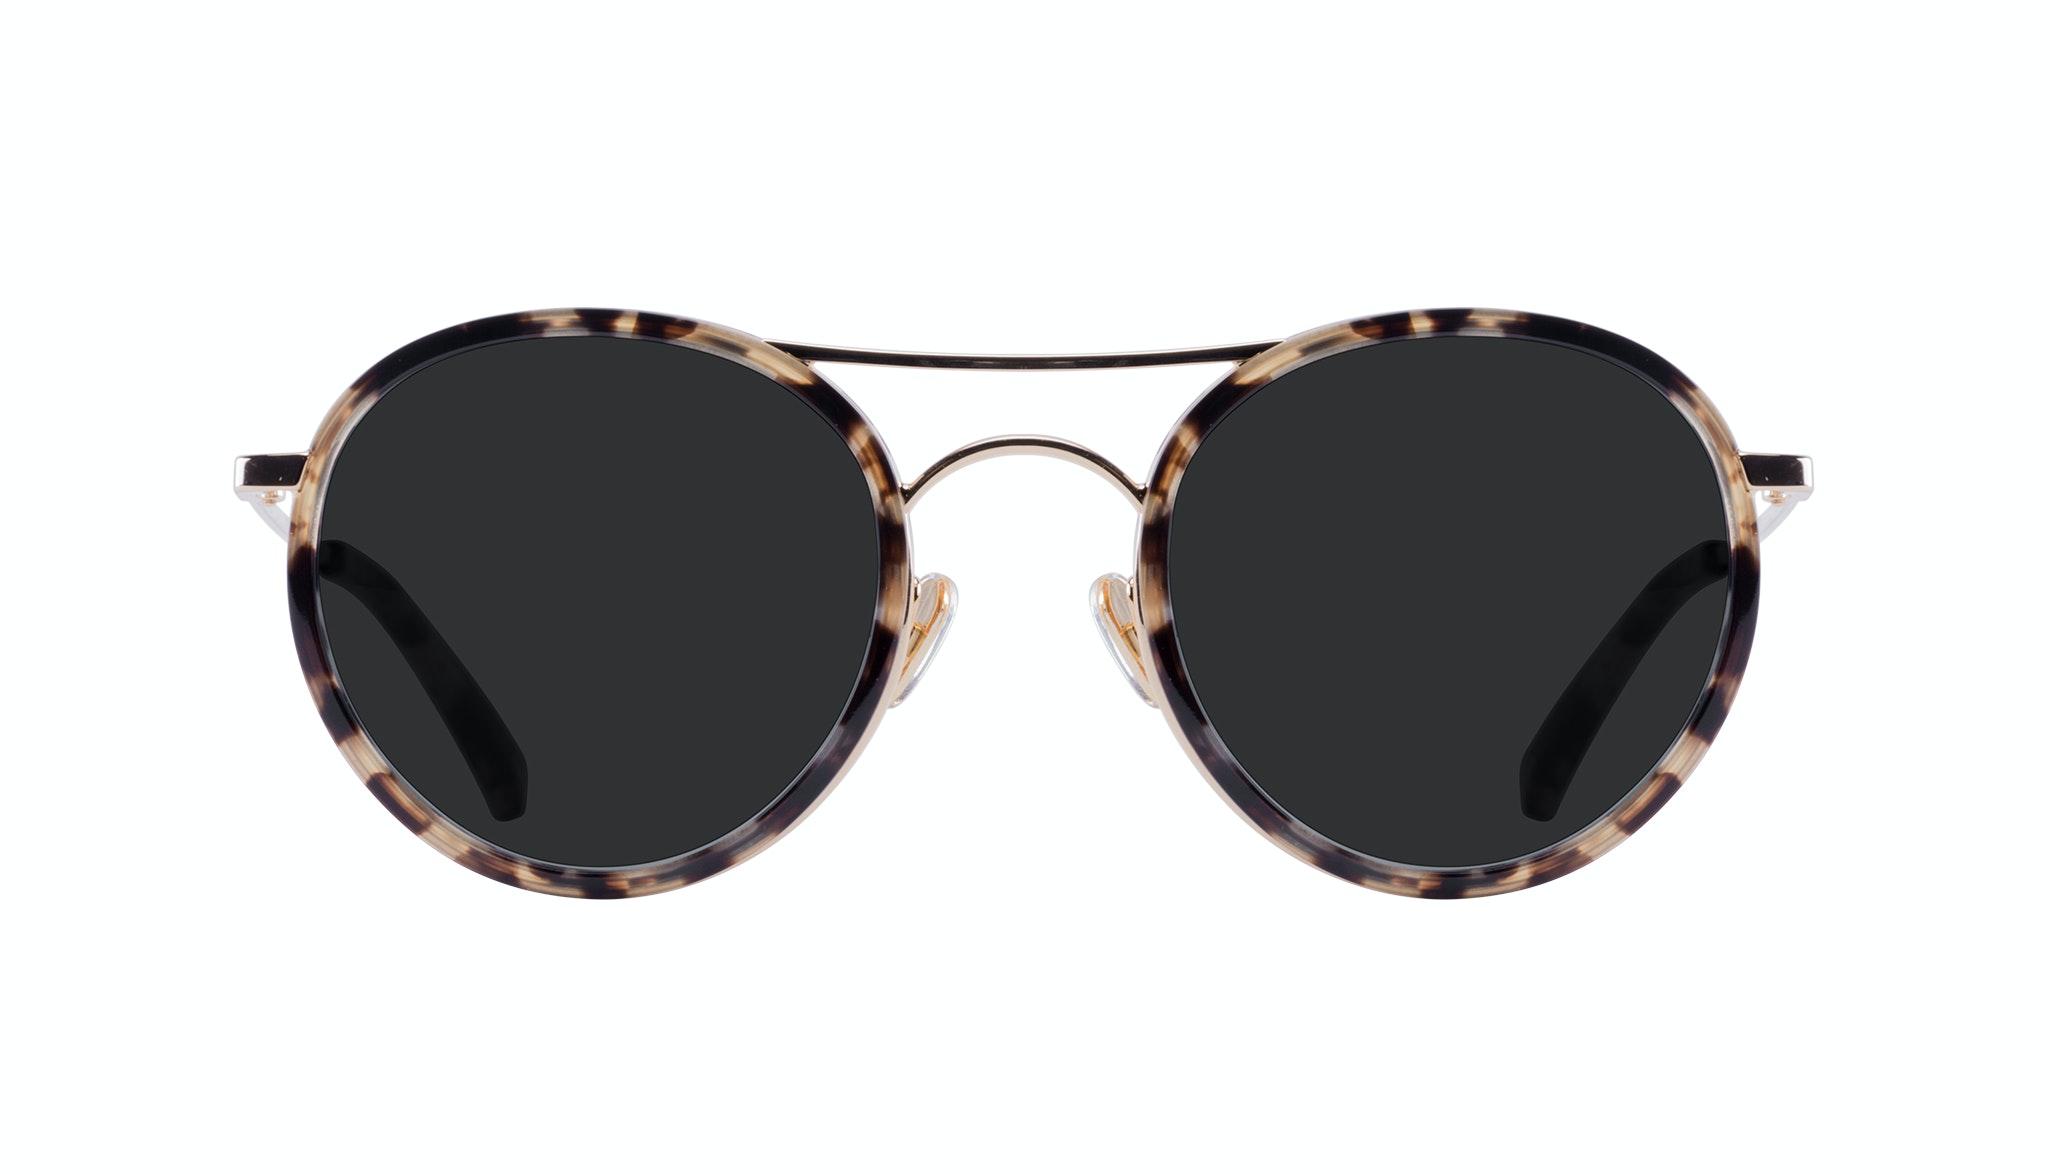 Affordable Fashion Glasses Aviator Round Sunglasses Women Dawn Tortoise